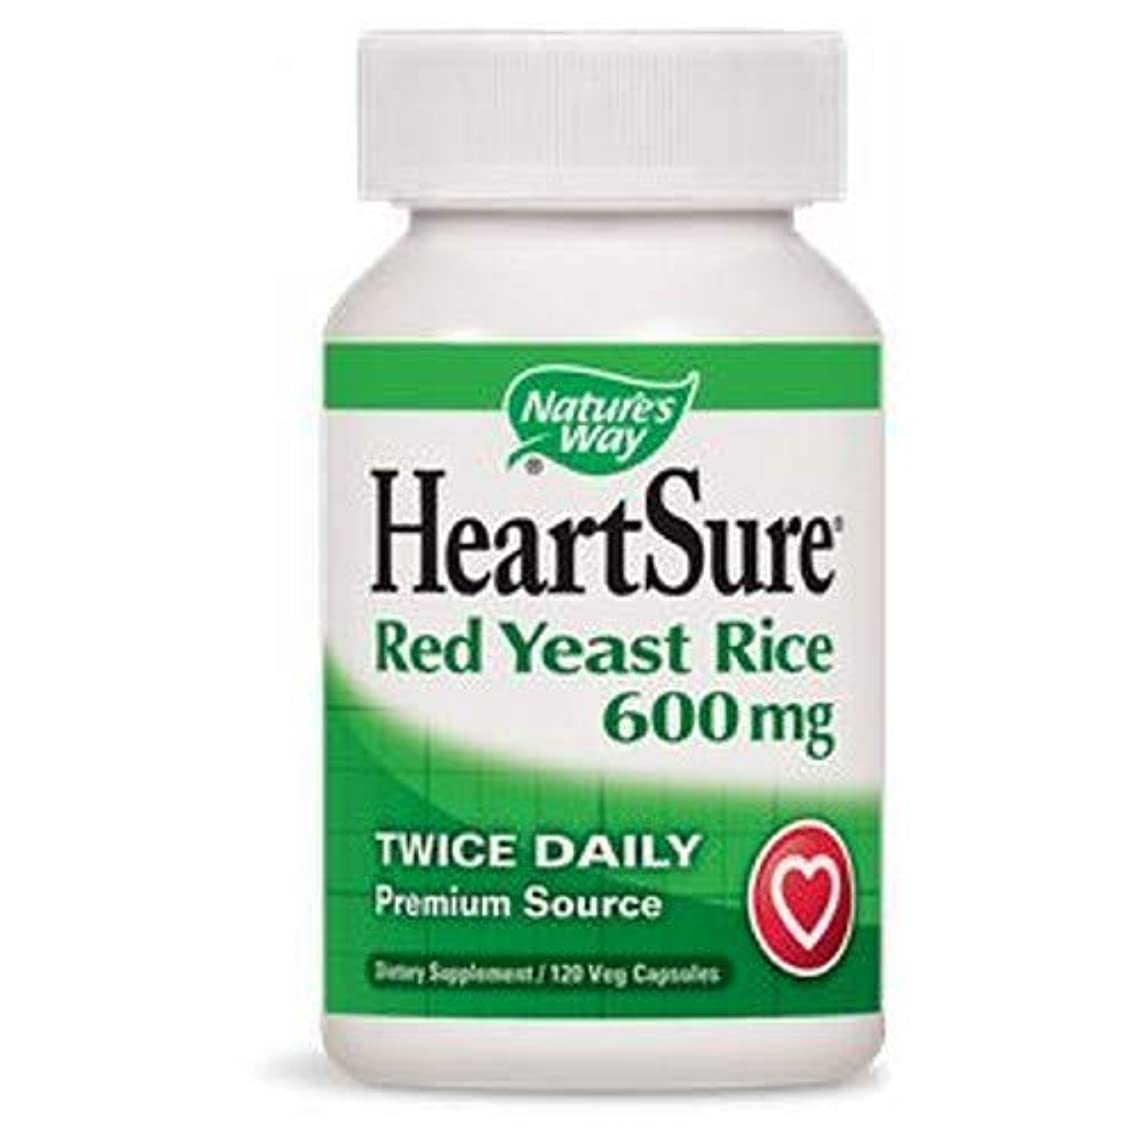 NATURE'S WAY HeartSure Red Yeast Rice + CoQ10 120 VEGICAPS